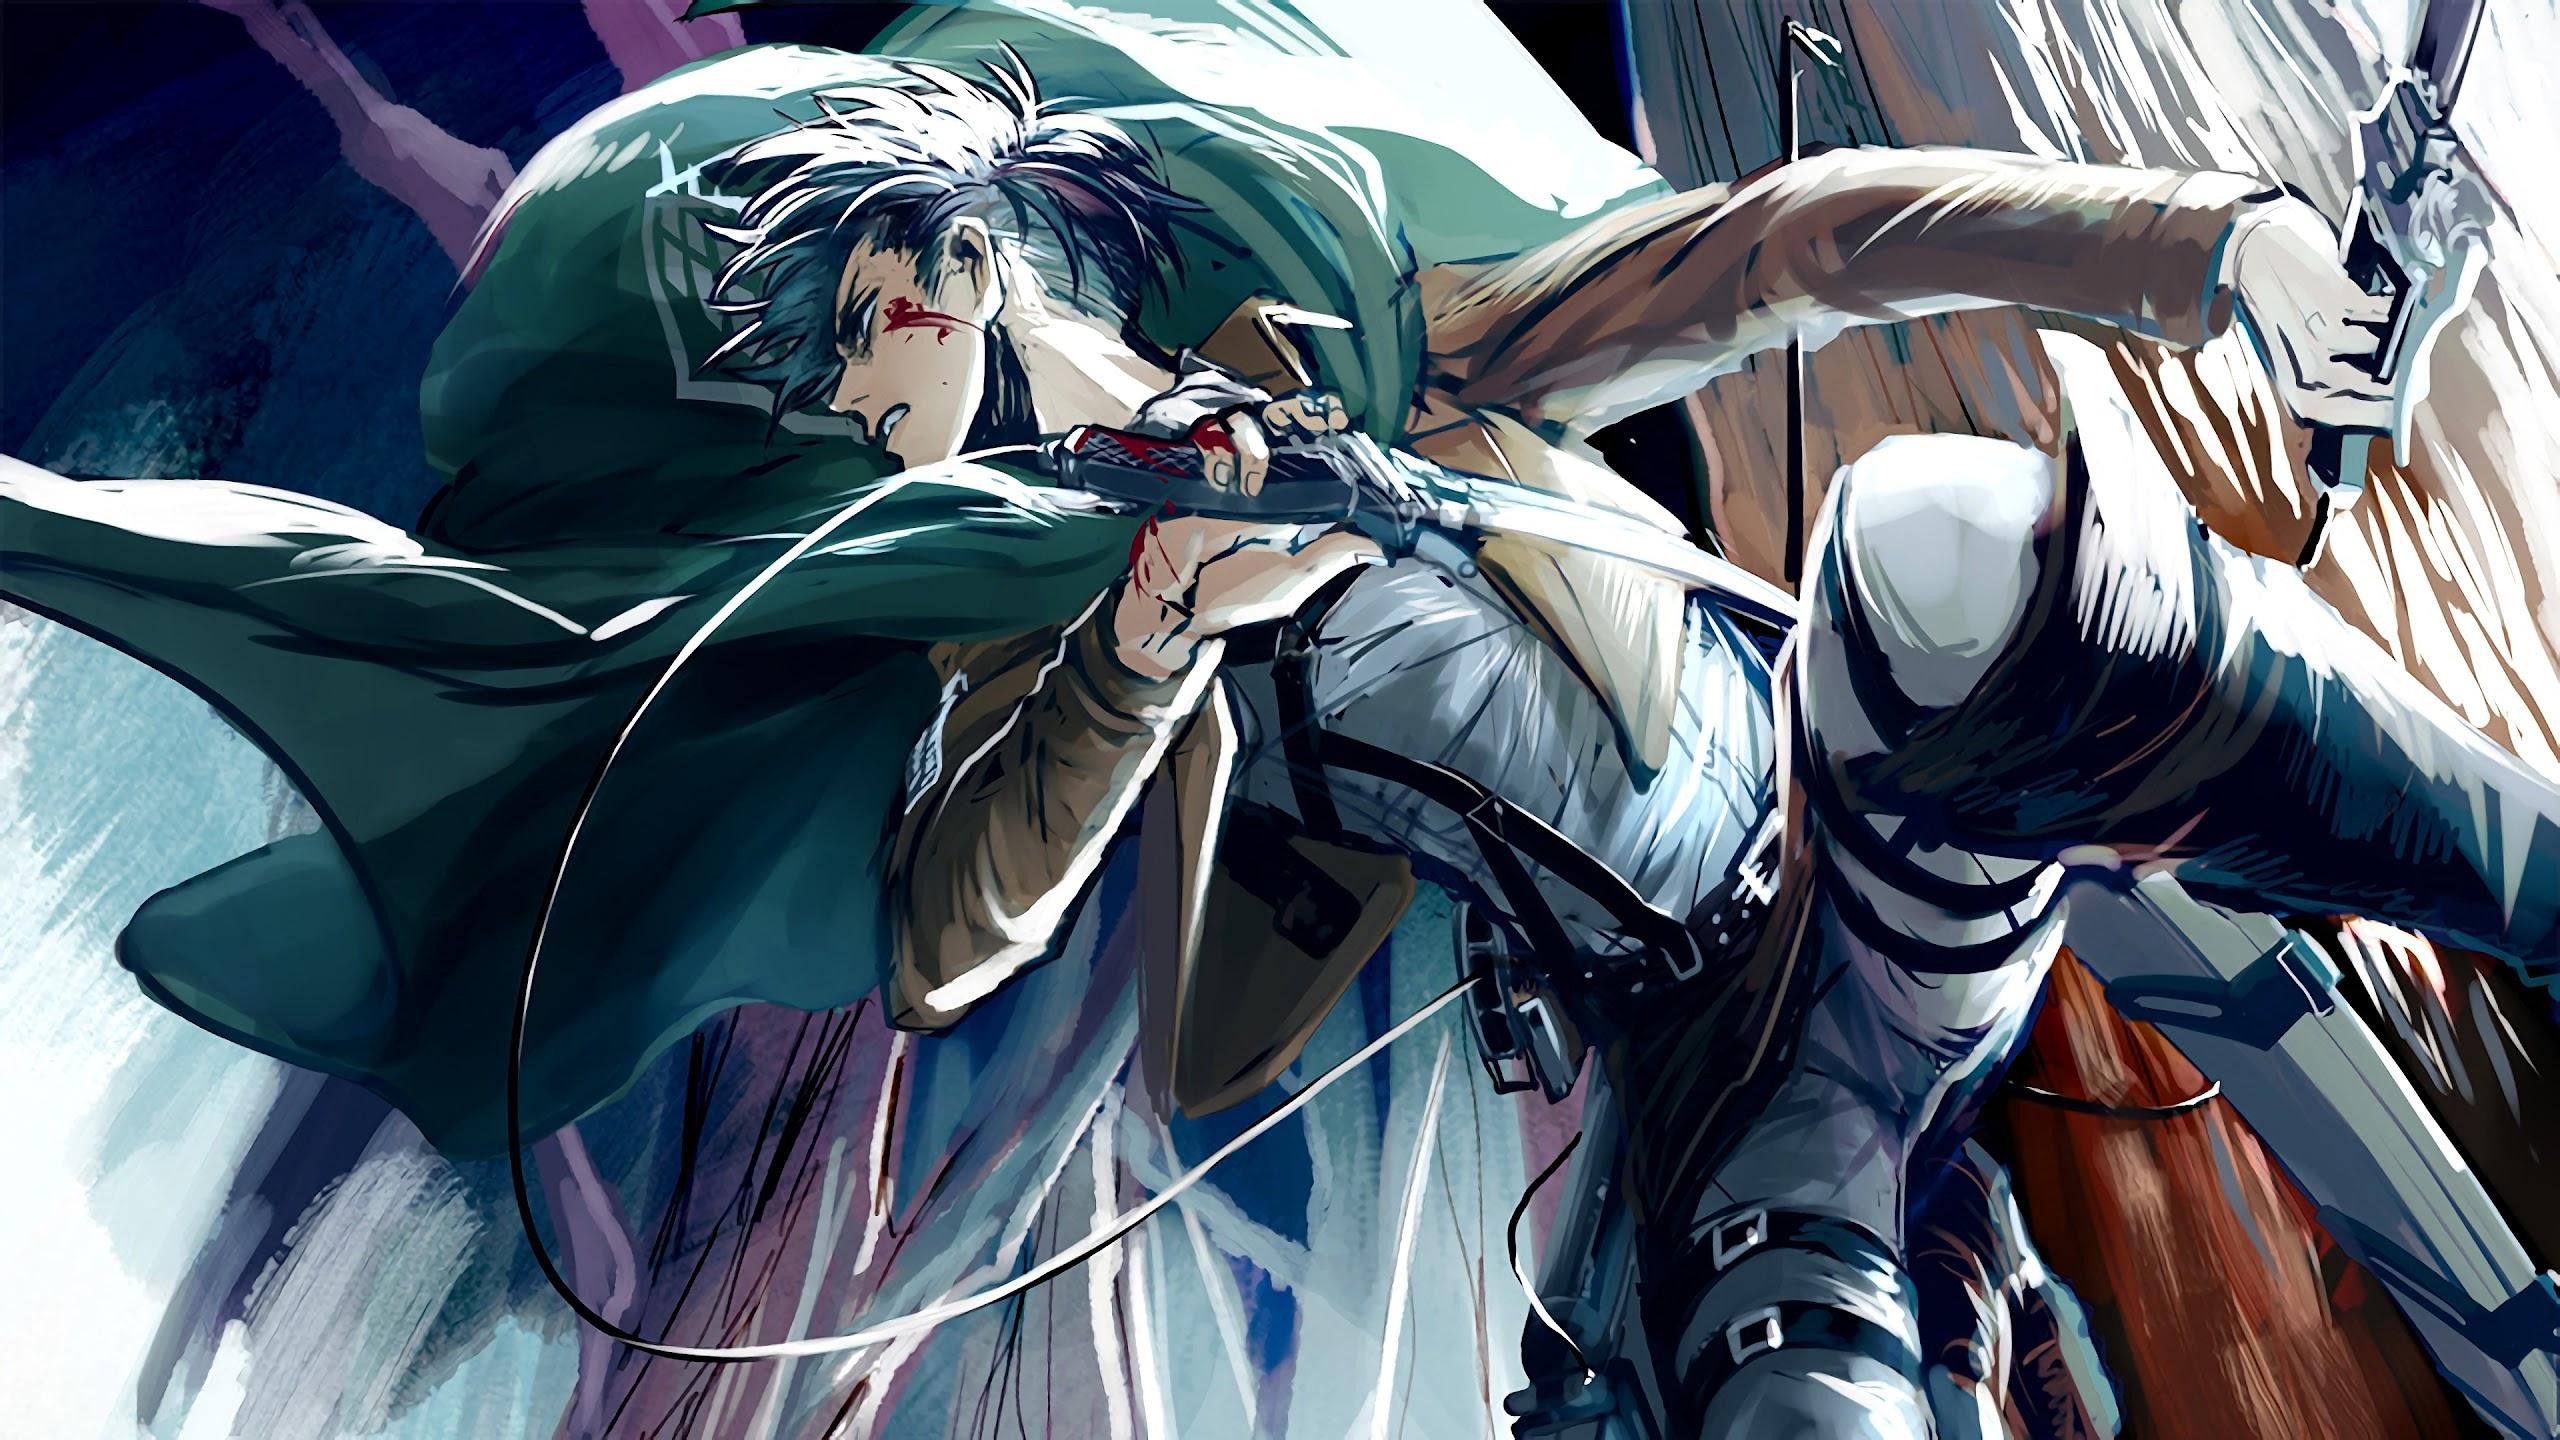 Levi Attack On Titan 4k Wallpaper 129